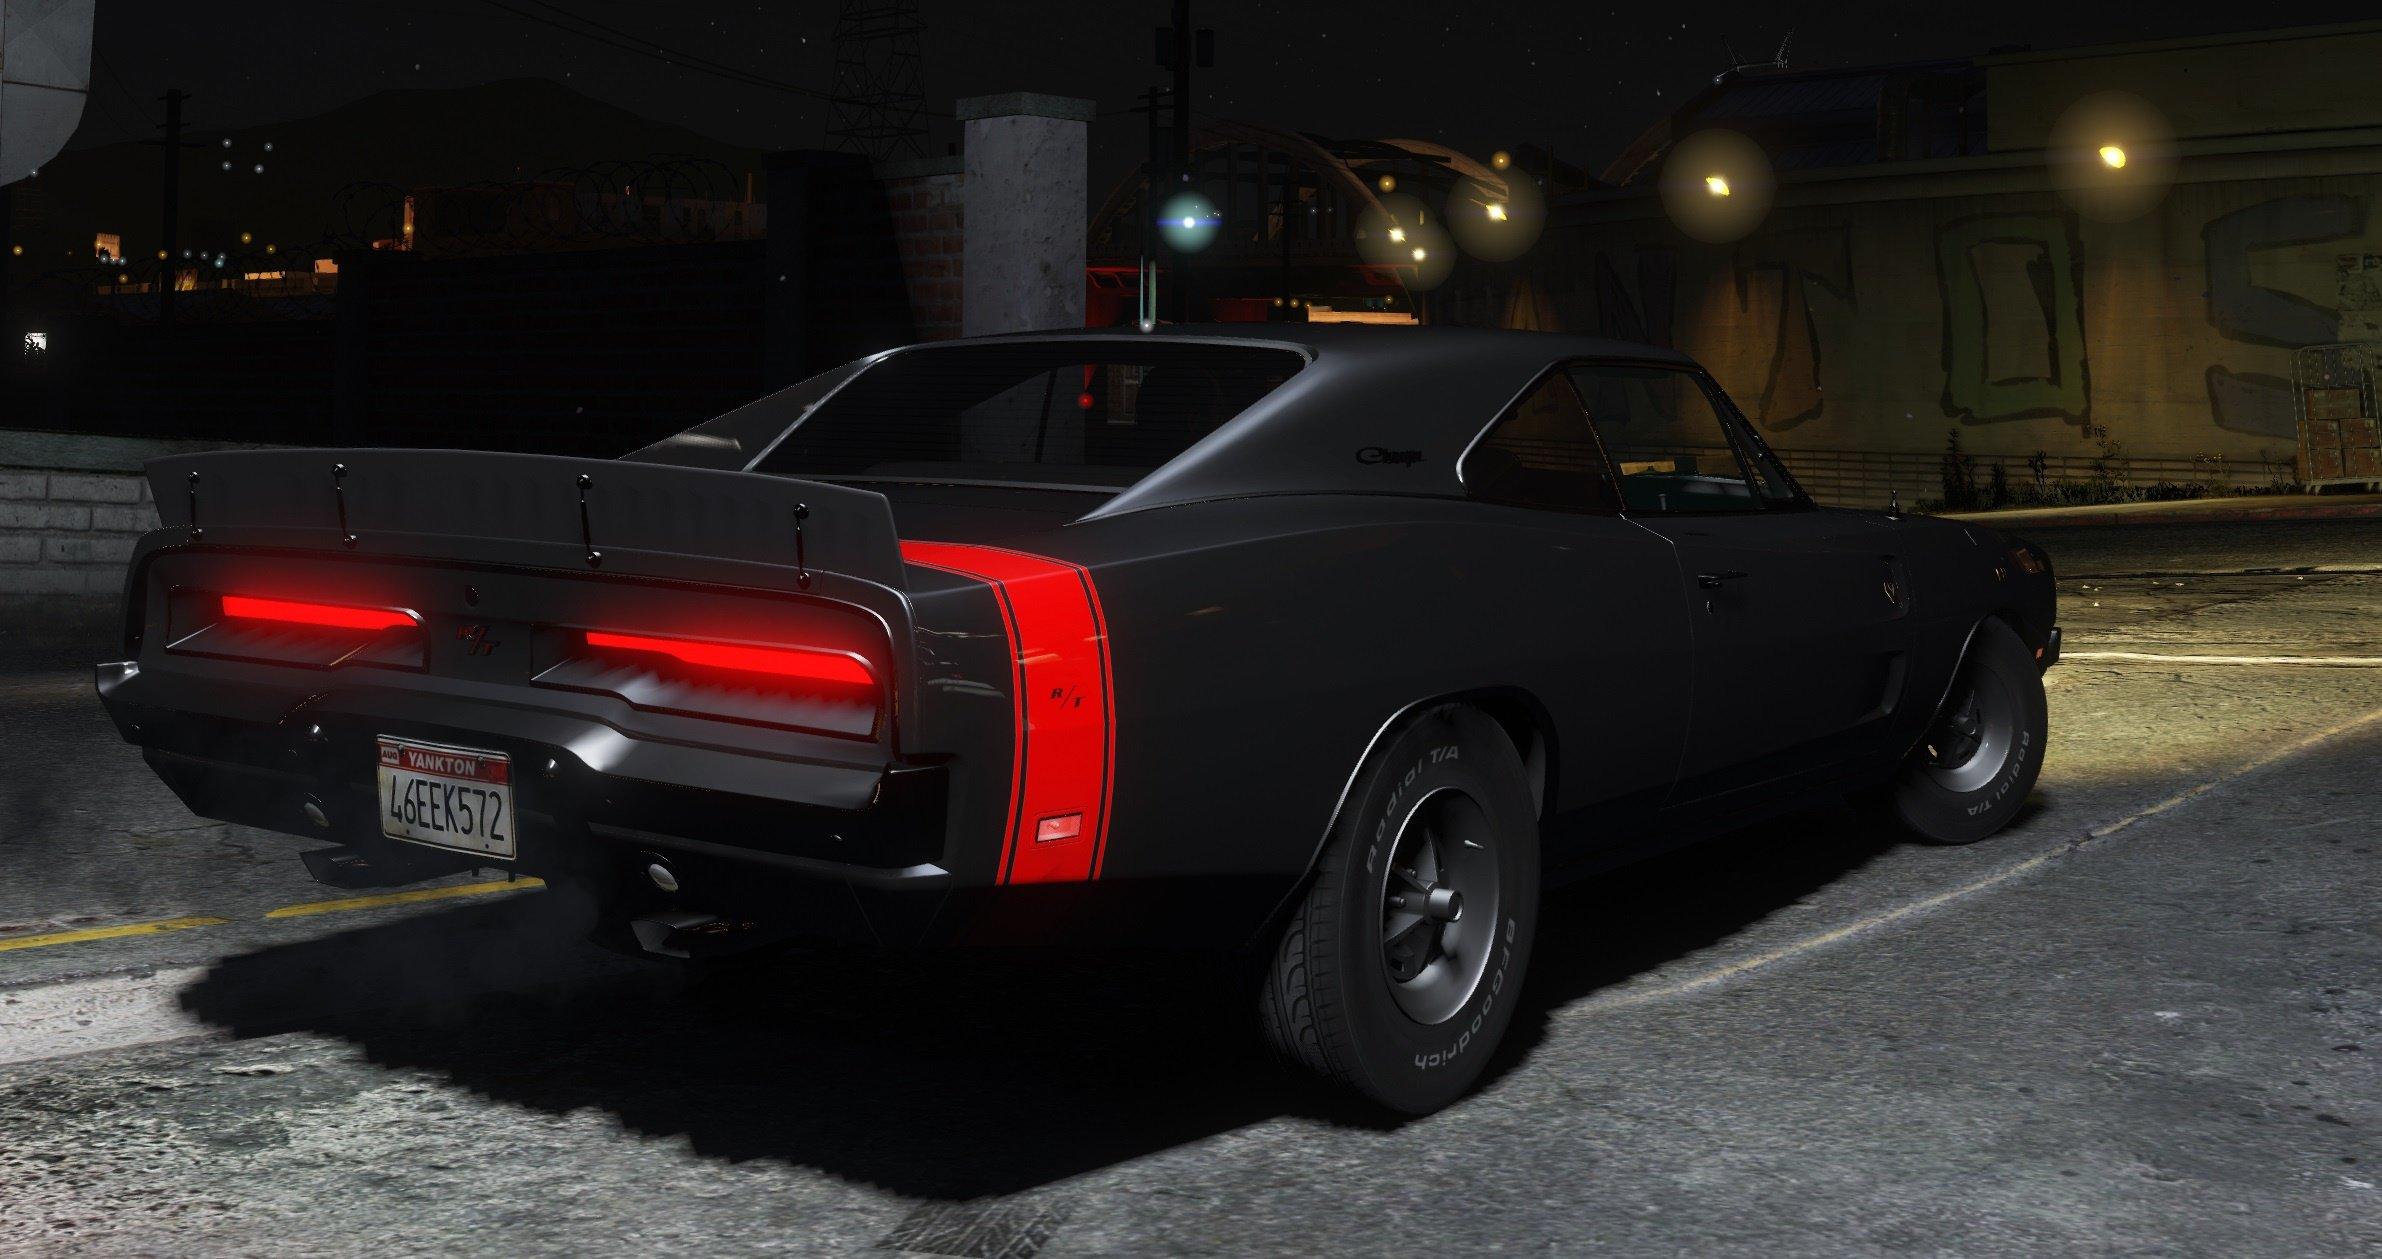 1969 Dodge Charger R/T для GTA V - Скриншот 3